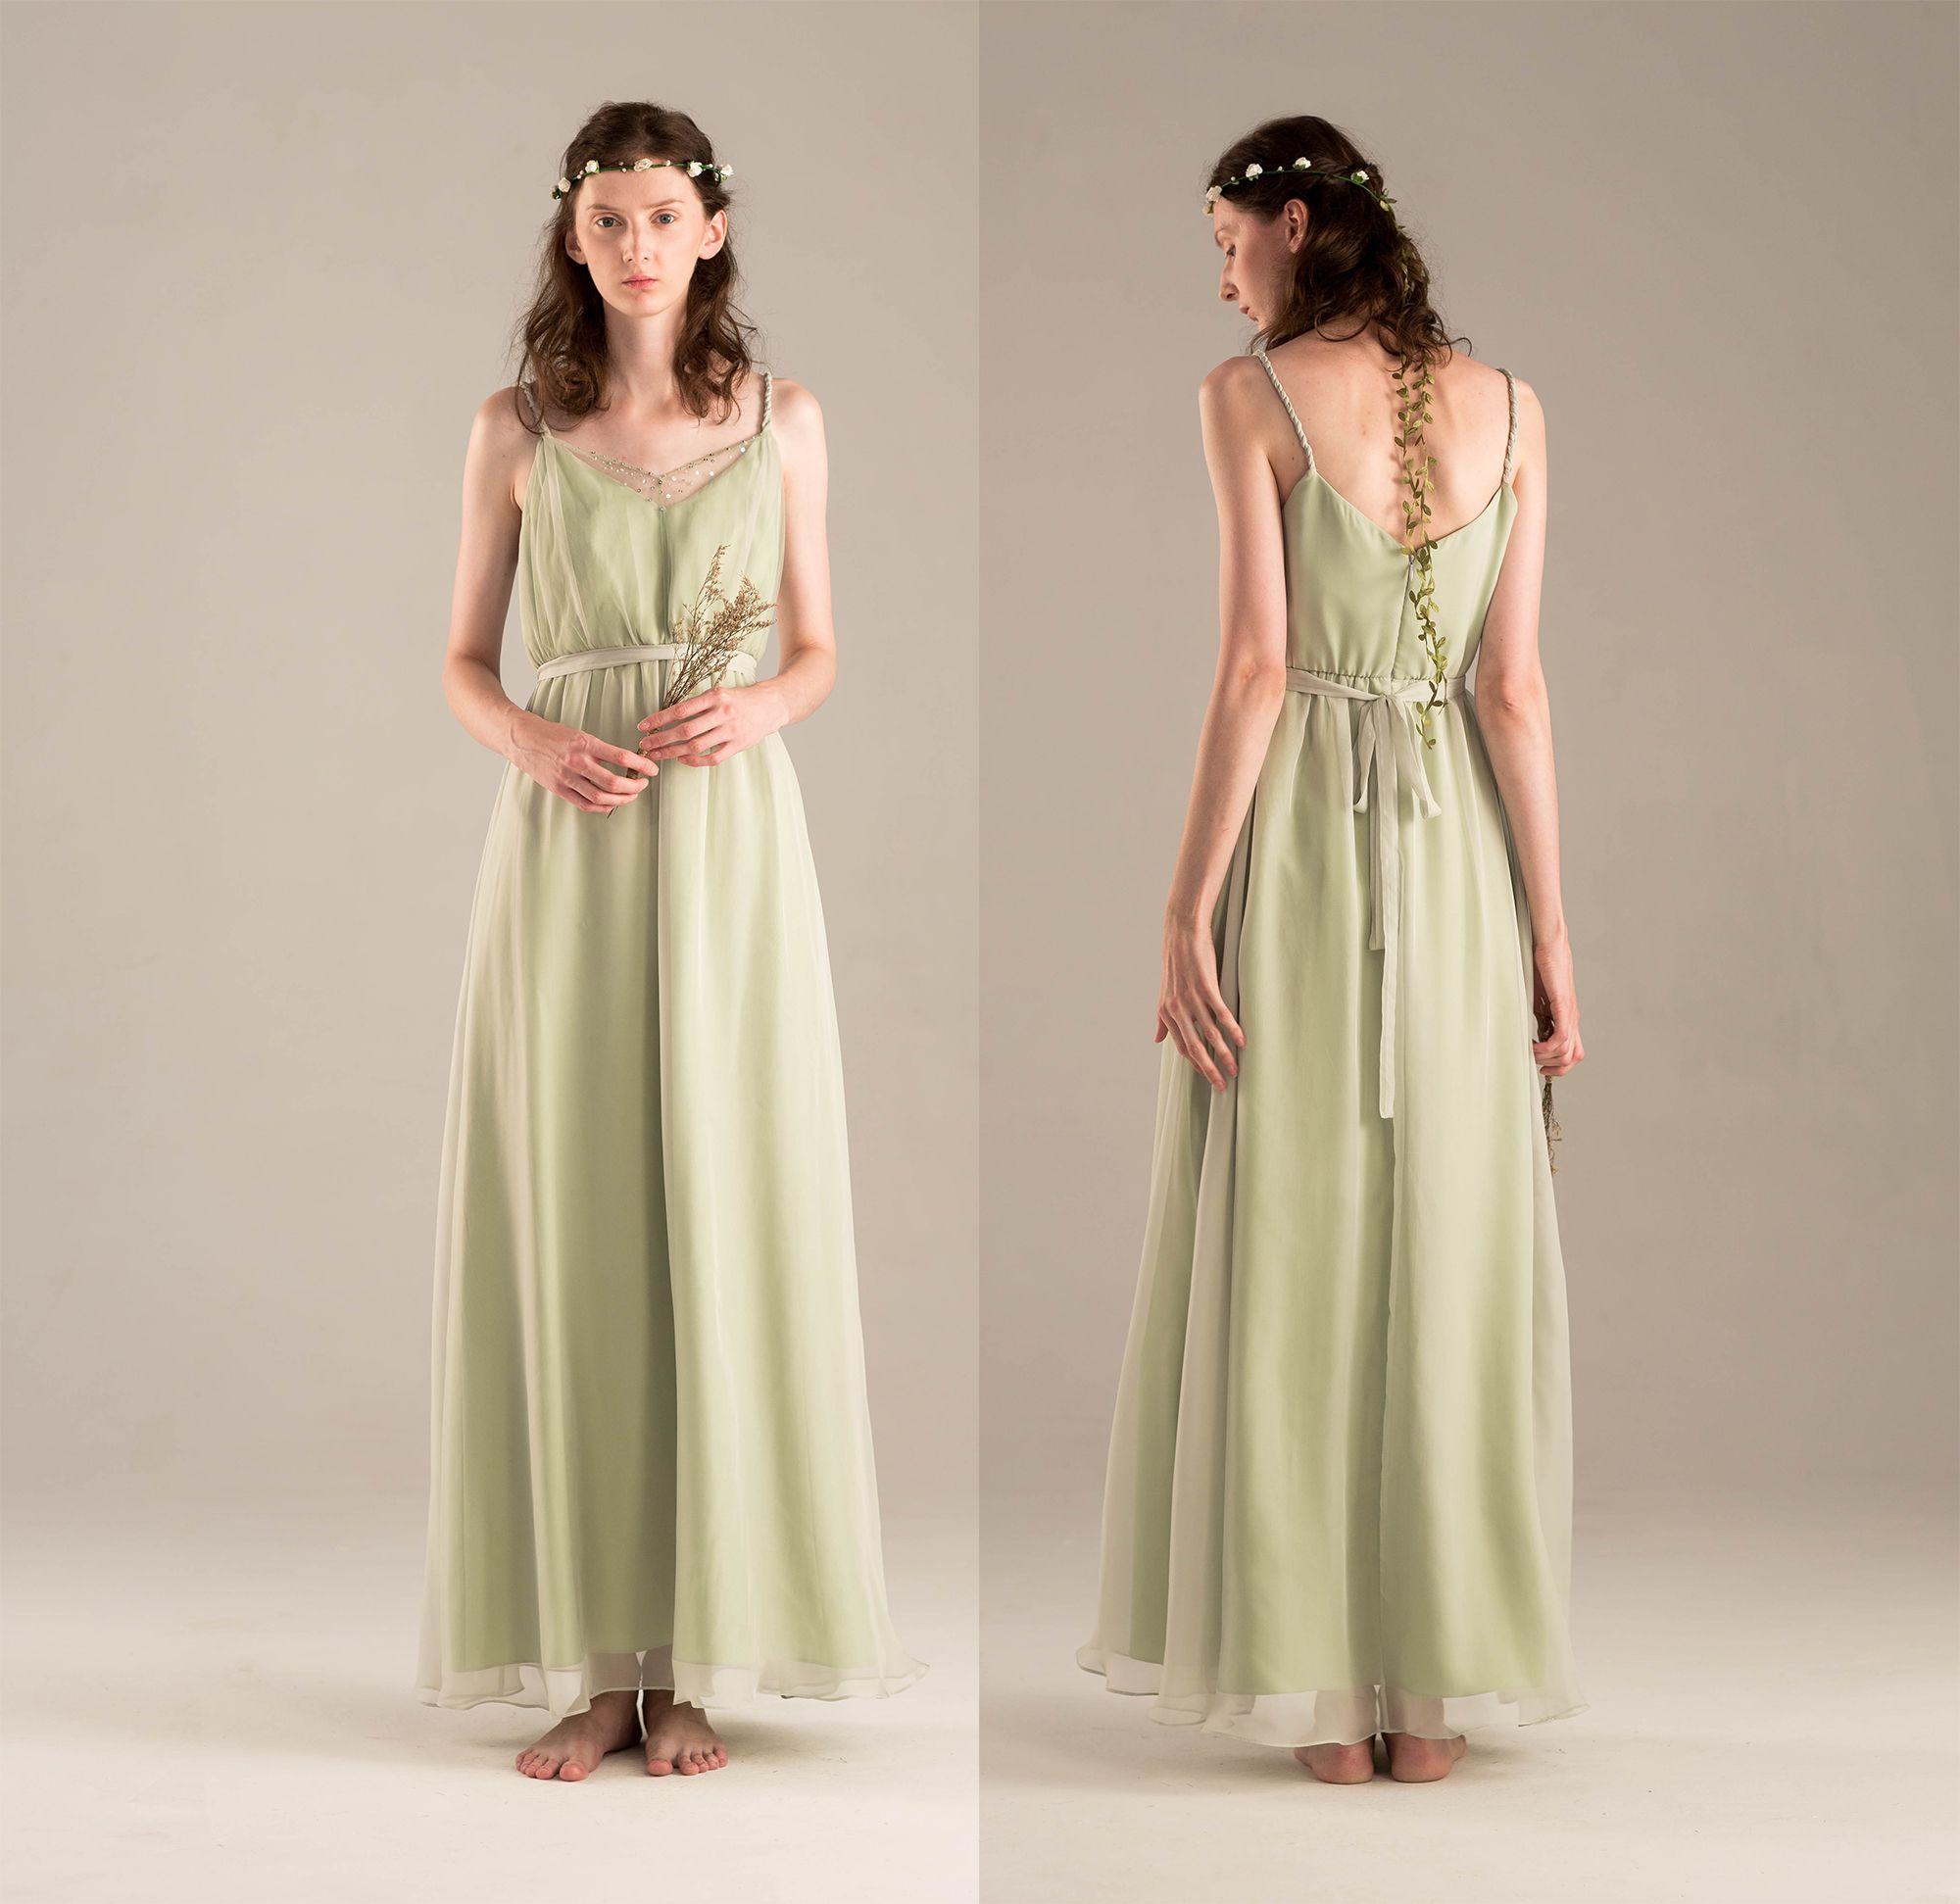 Dusty shale bridesmaid dress spaghetti strap chiffon wedding dress